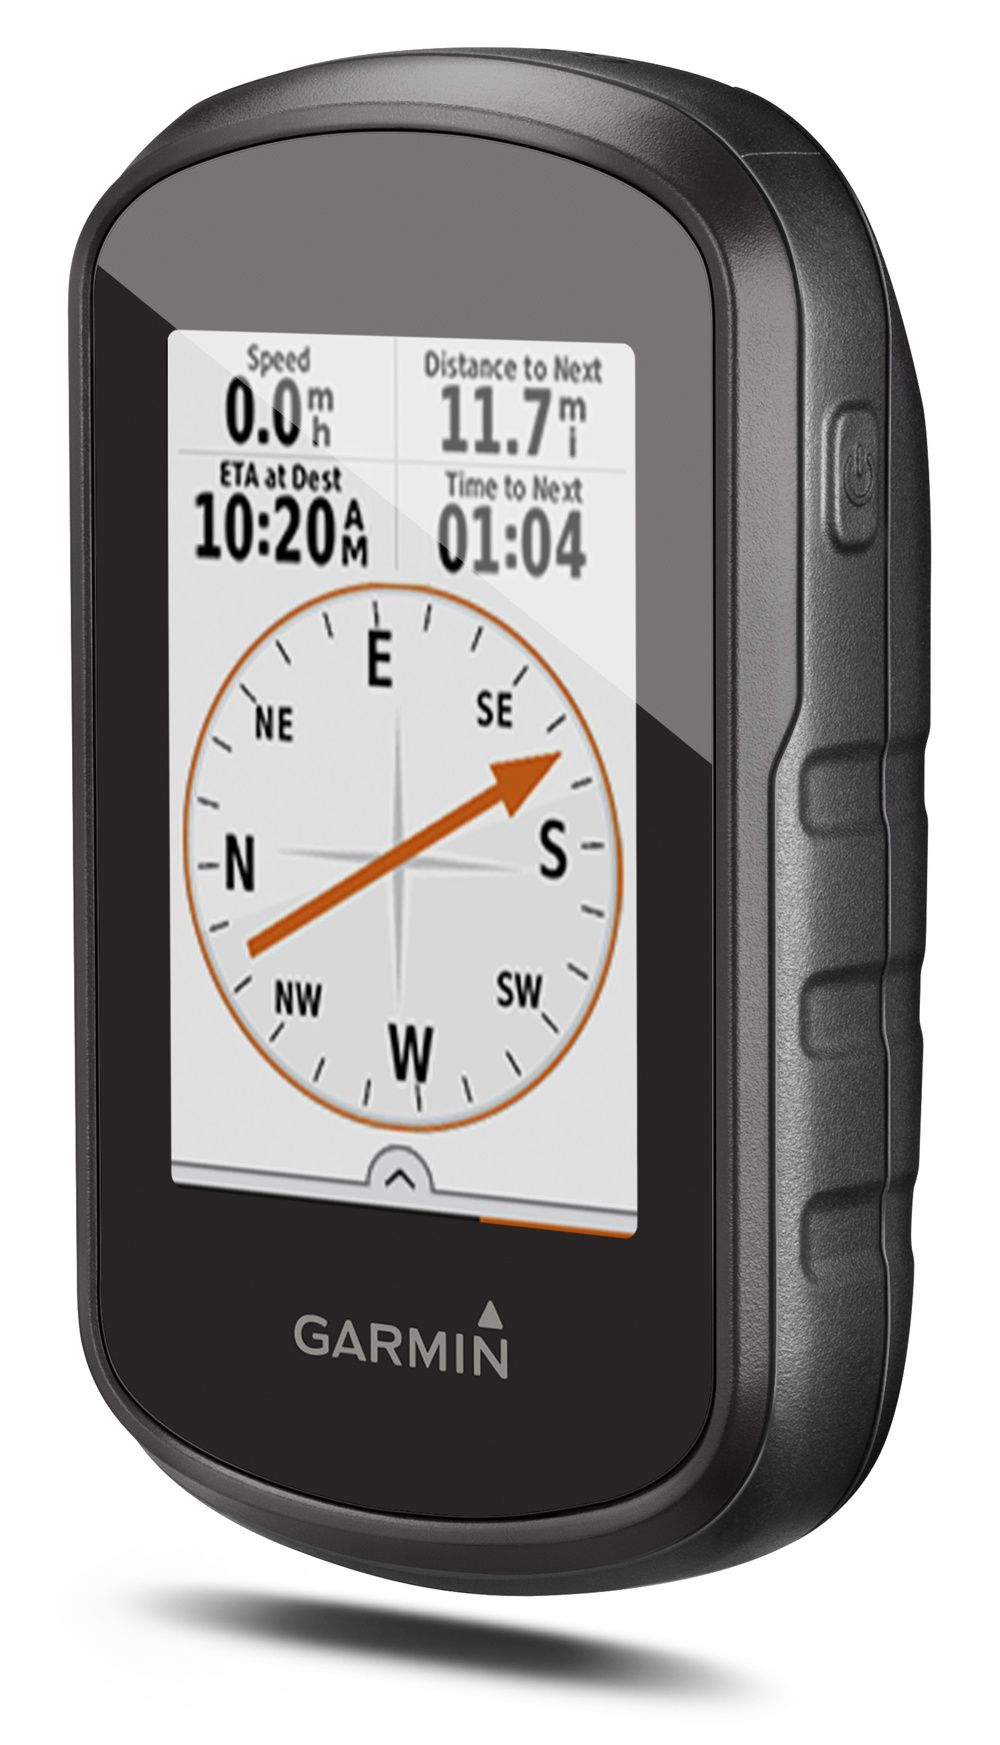 Garmin eTrex35